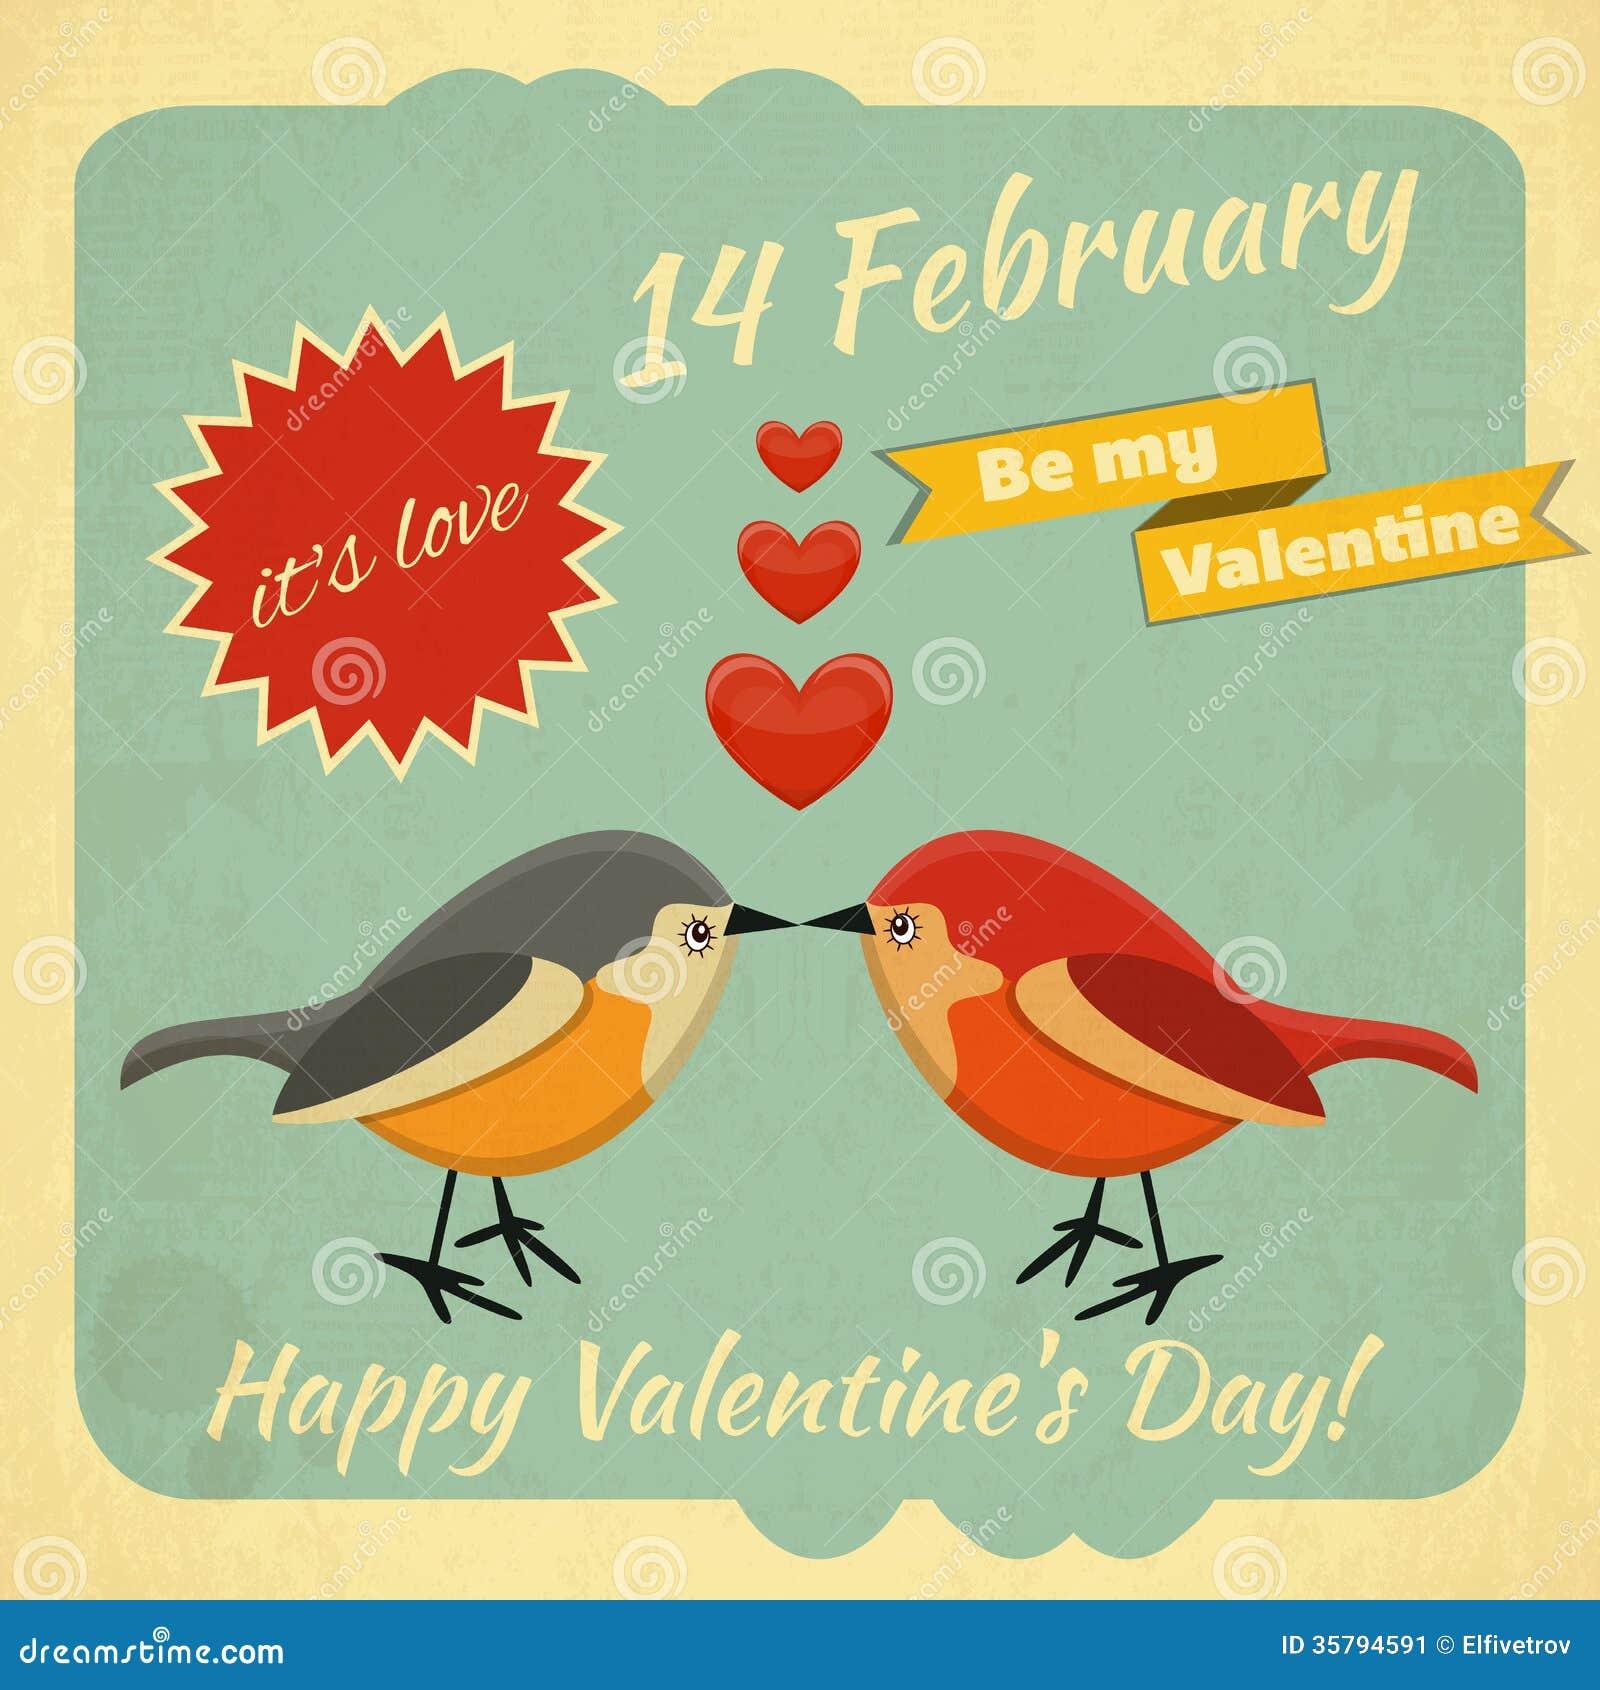 Vintage Valentines Day Card Stock Vector - Illustration of design ...